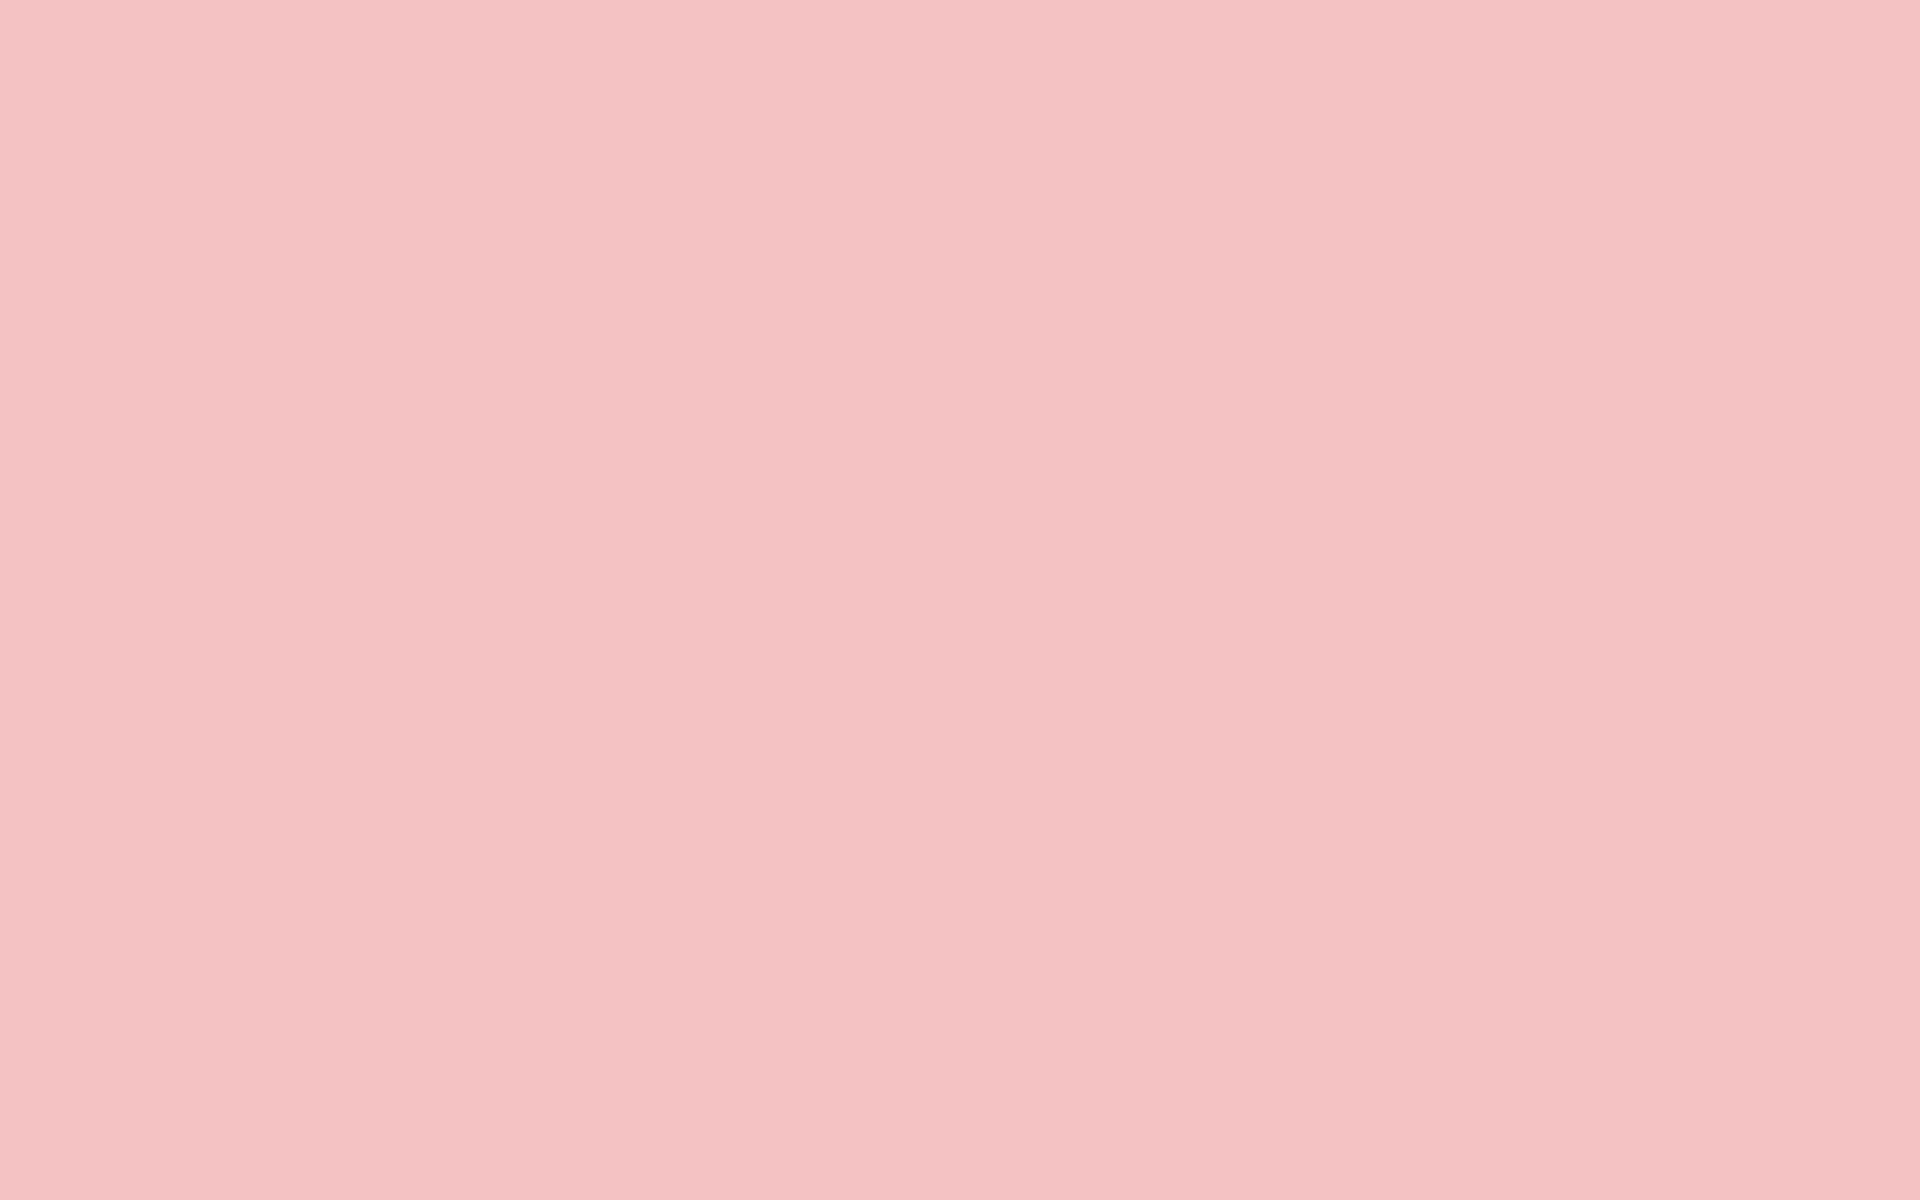 Light Pink 1920x1200